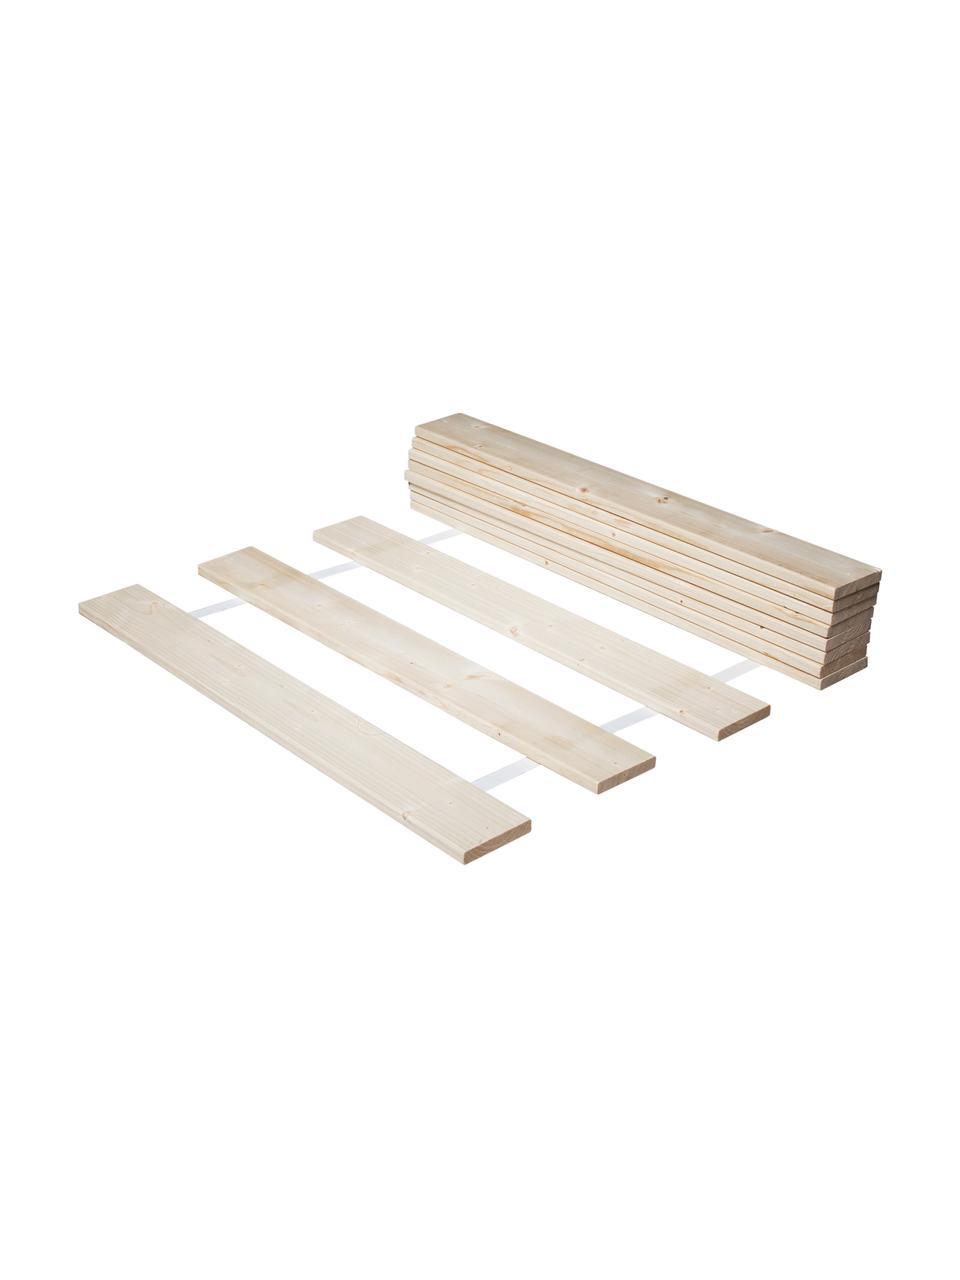 Lattenbodem Juan Carlos, 2-delig, Lijstwerk: licht houtkleurig. Deksel: wit, 160 x 200 cm